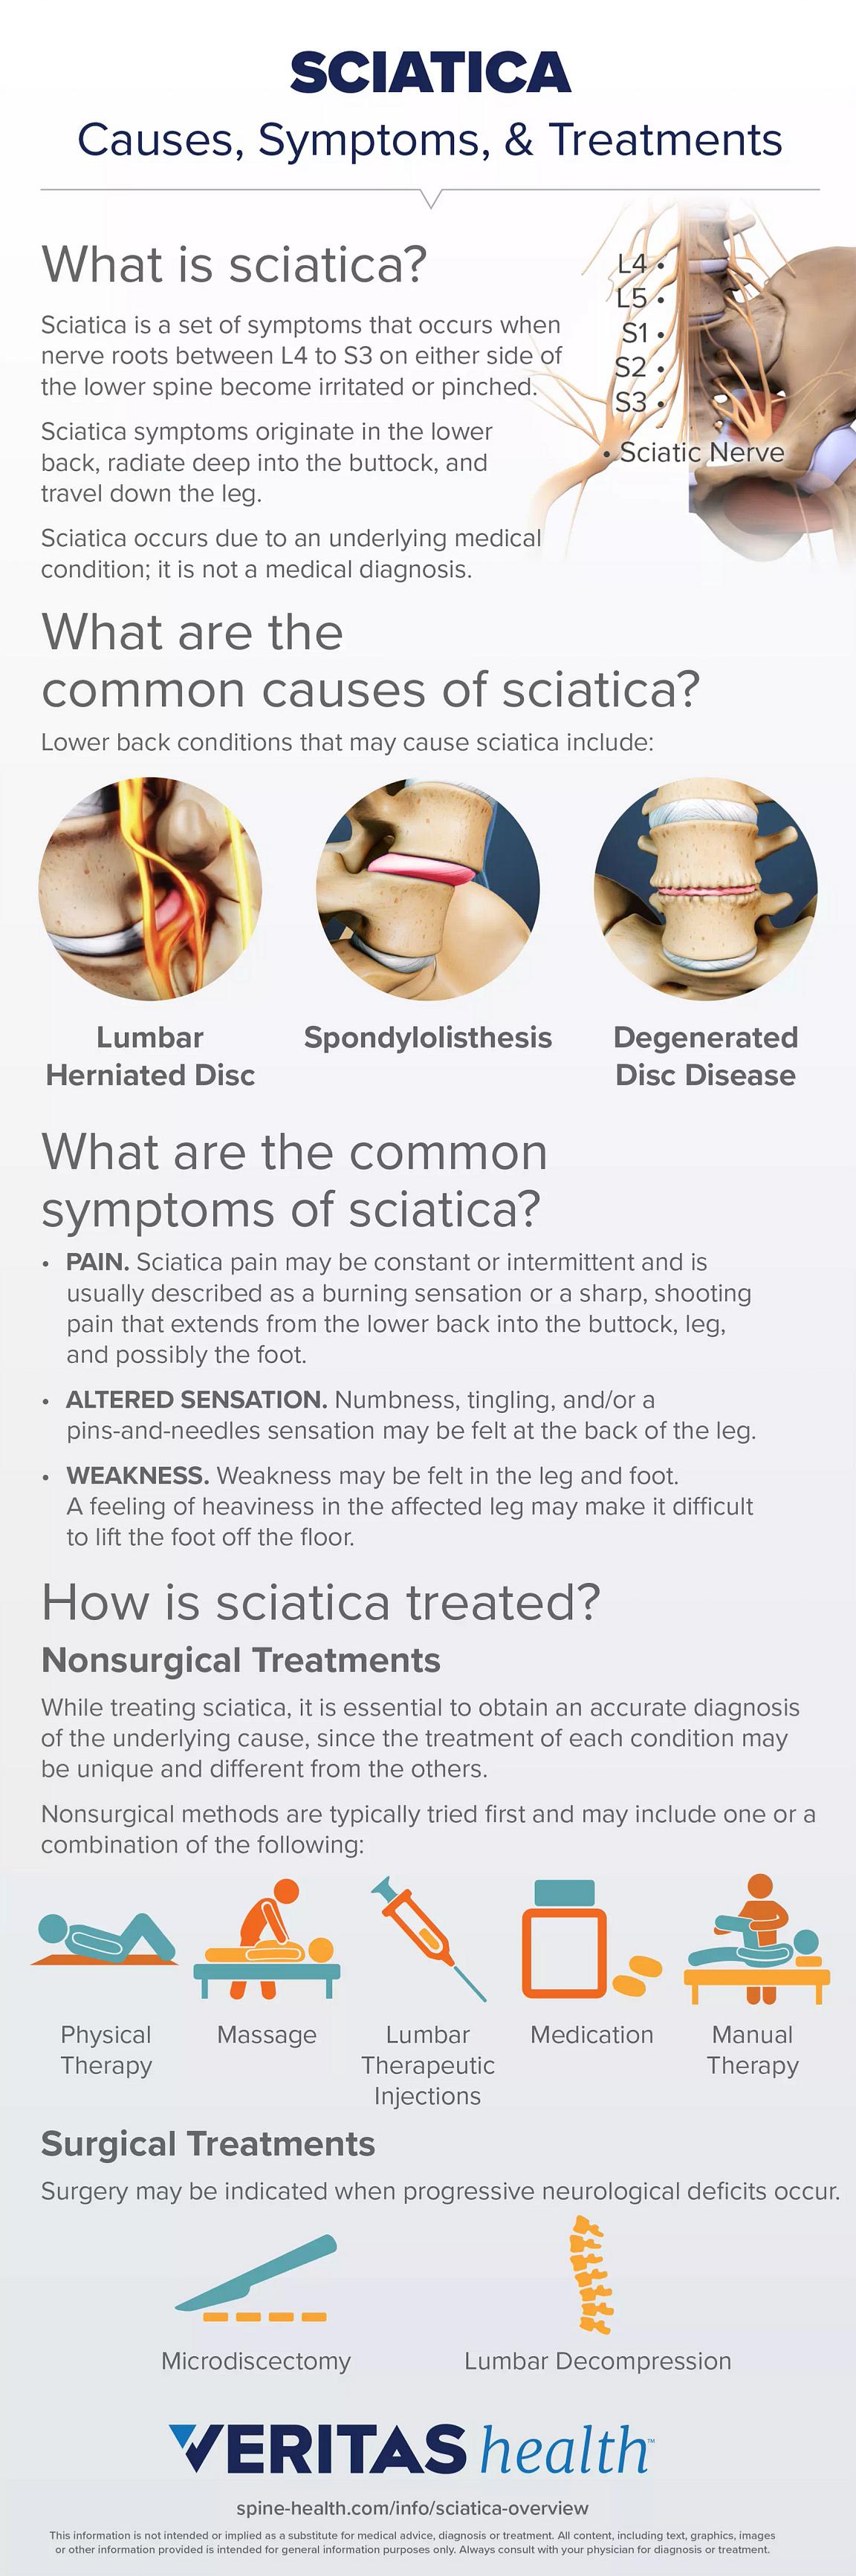 Sciatica Overview